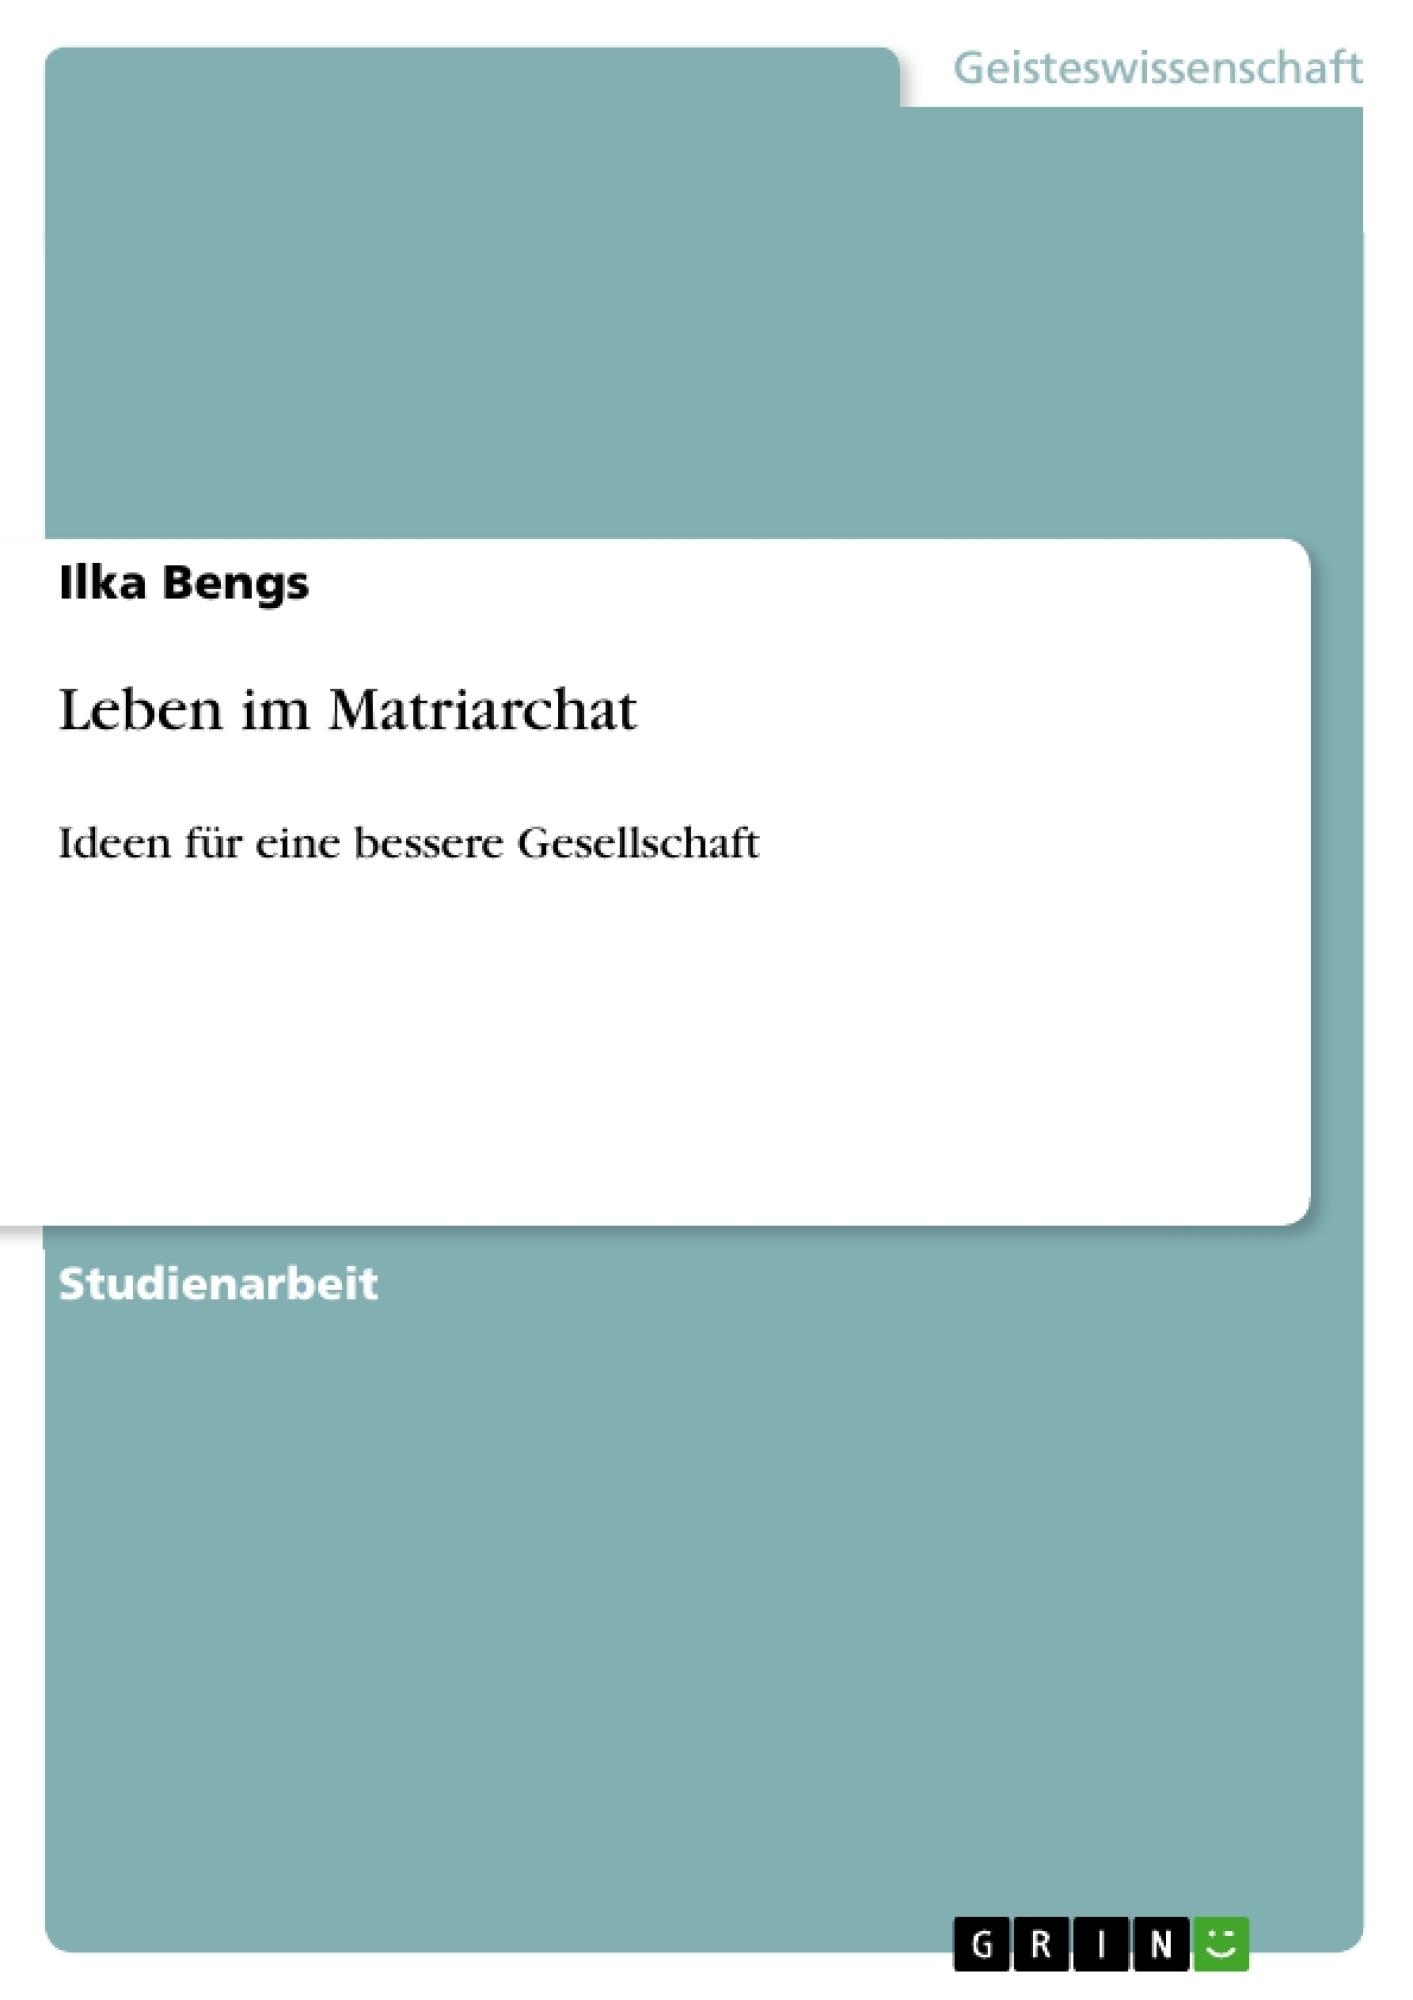 Titel: Leben im Matriarchat